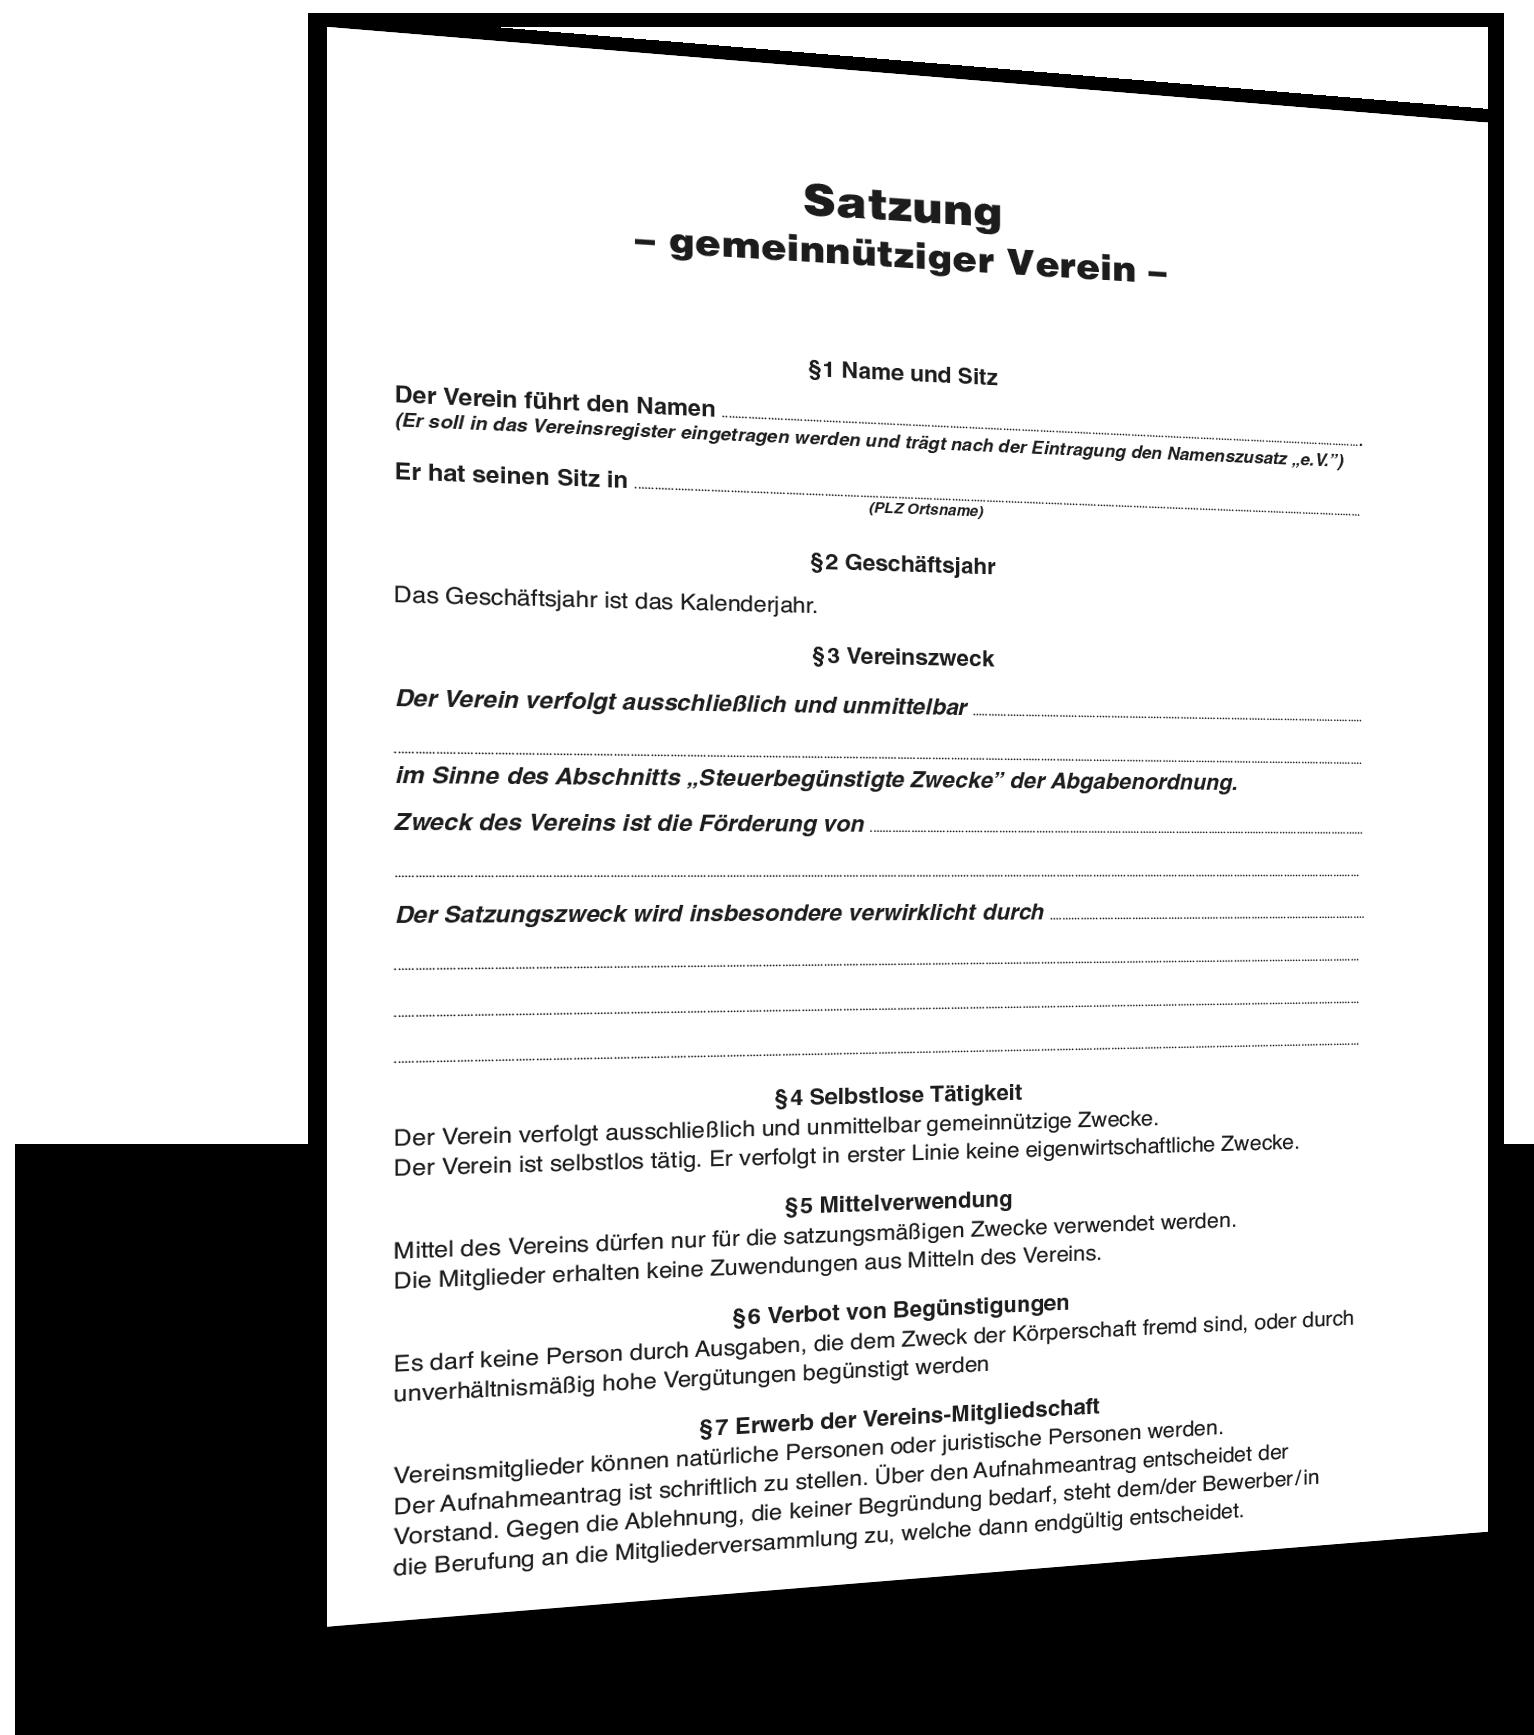 vereinssatzung muster - Vereinssatzung Muster